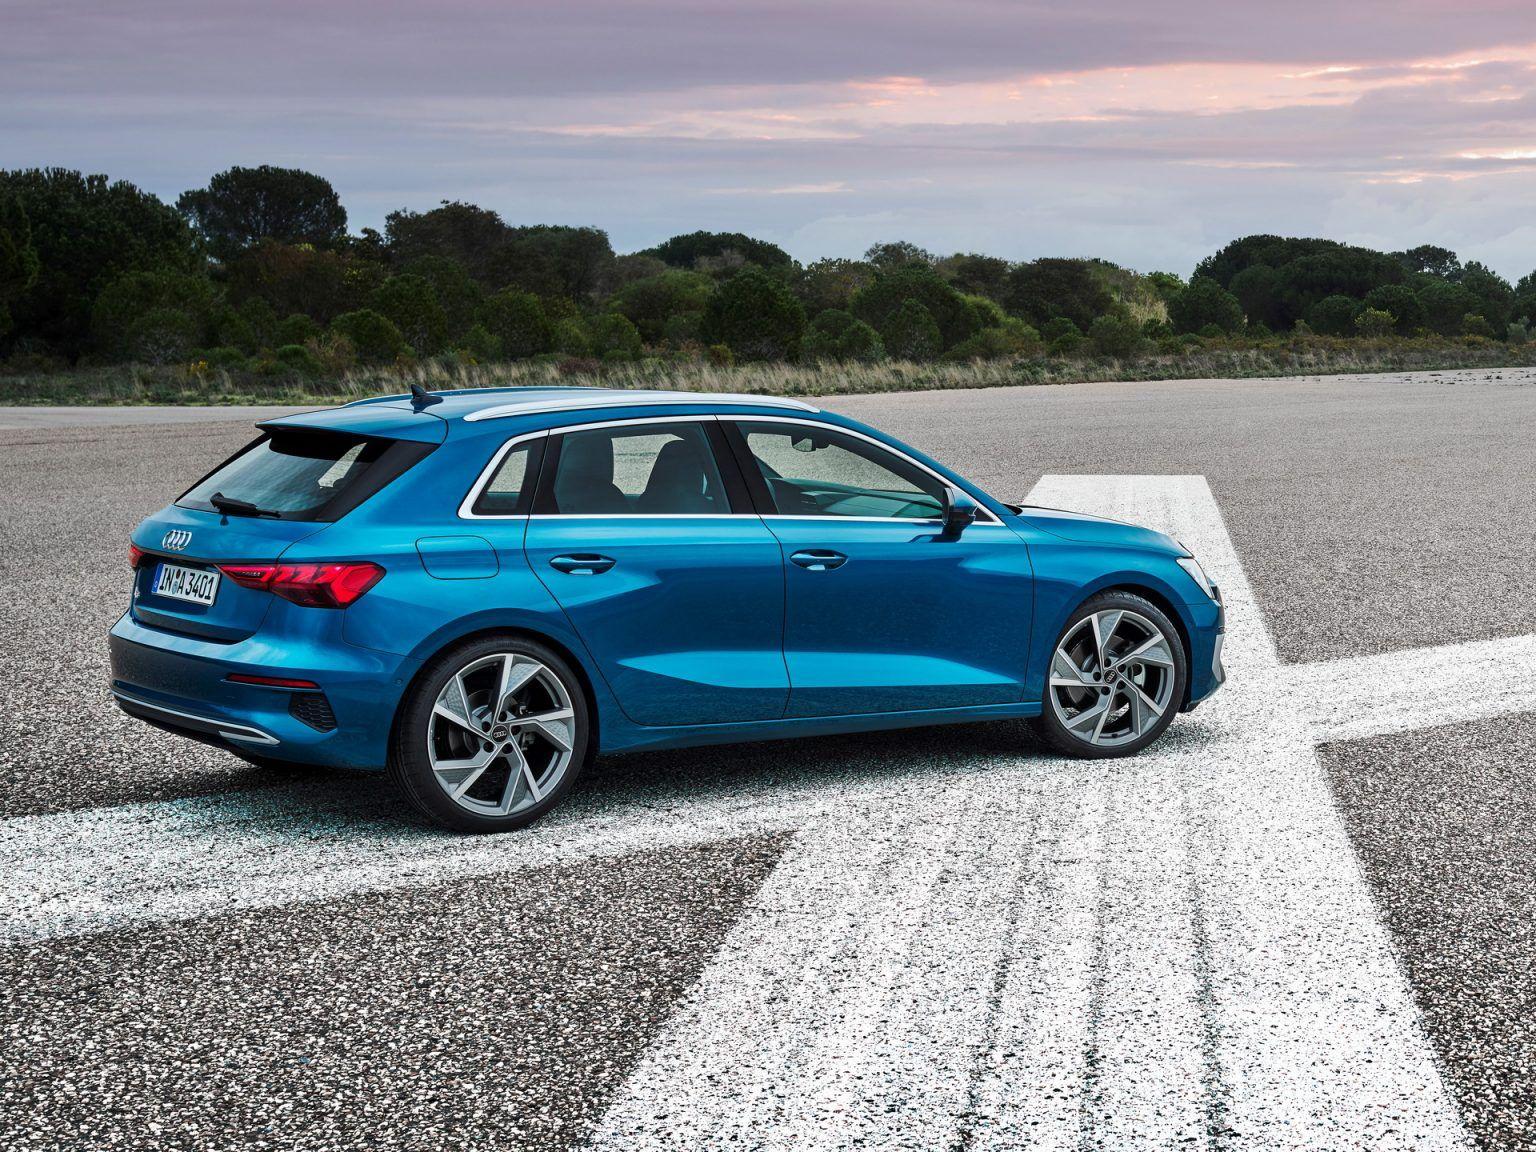 Kekurangan Audi A3 Sportback Top Model Tahun Ini